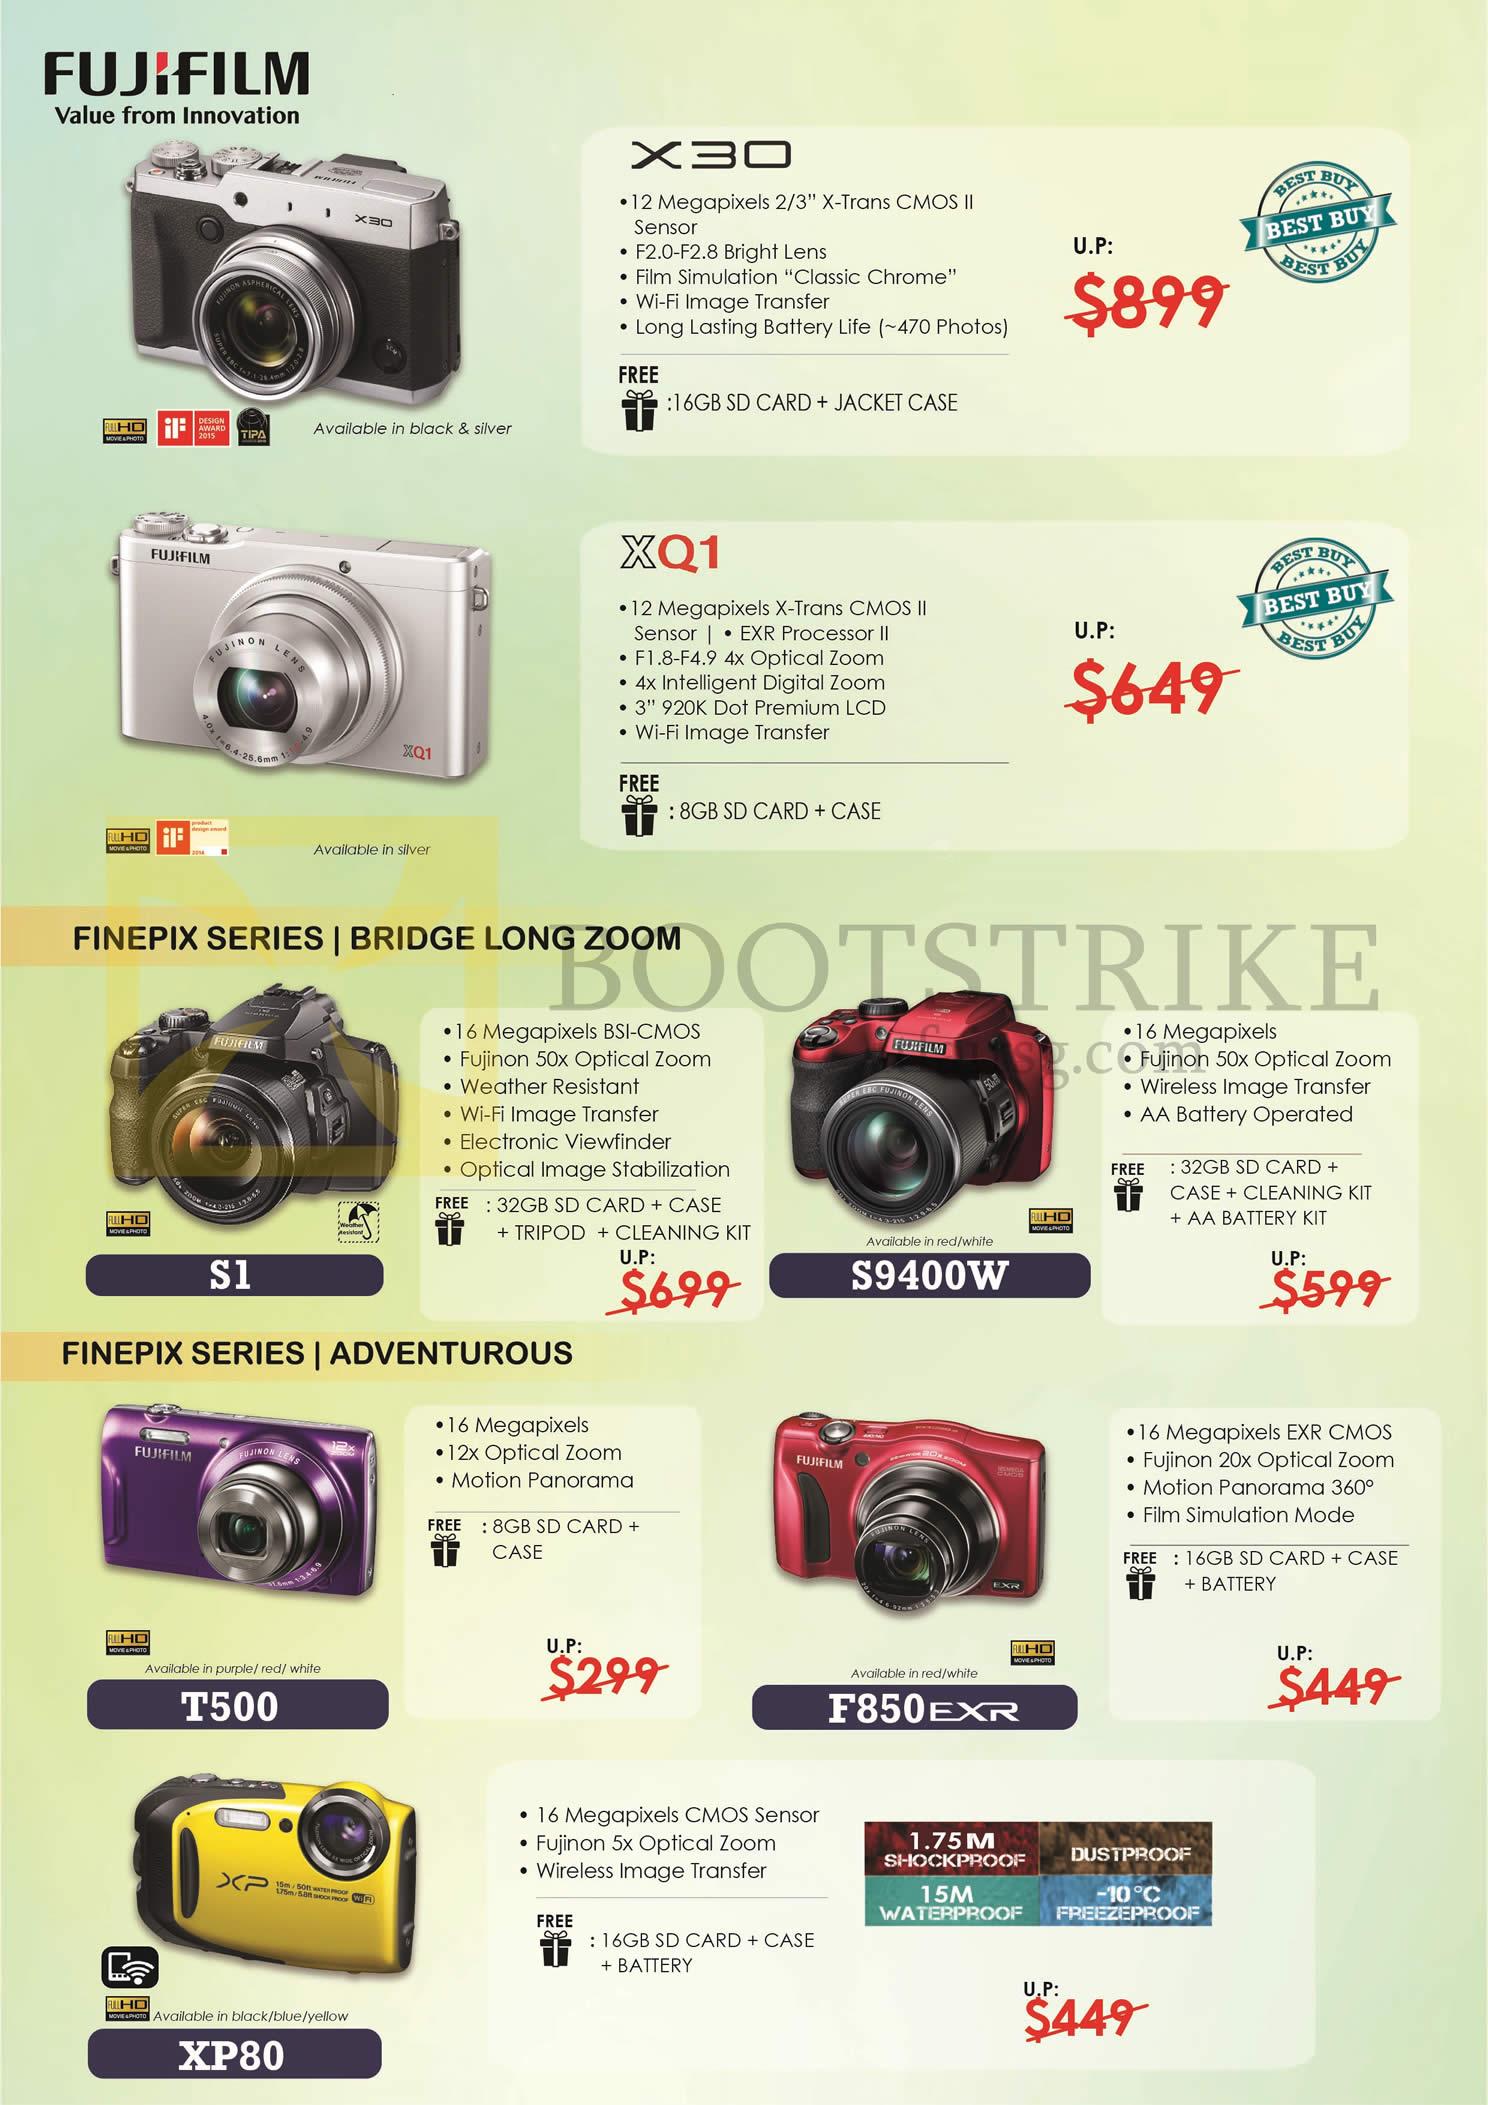 COMEX 2016 price list image brochure of Fujifilm (No Prices) Digital Cameras Finepix X30, XQ1, S1, S9400W, T500, F850EXR, XP80